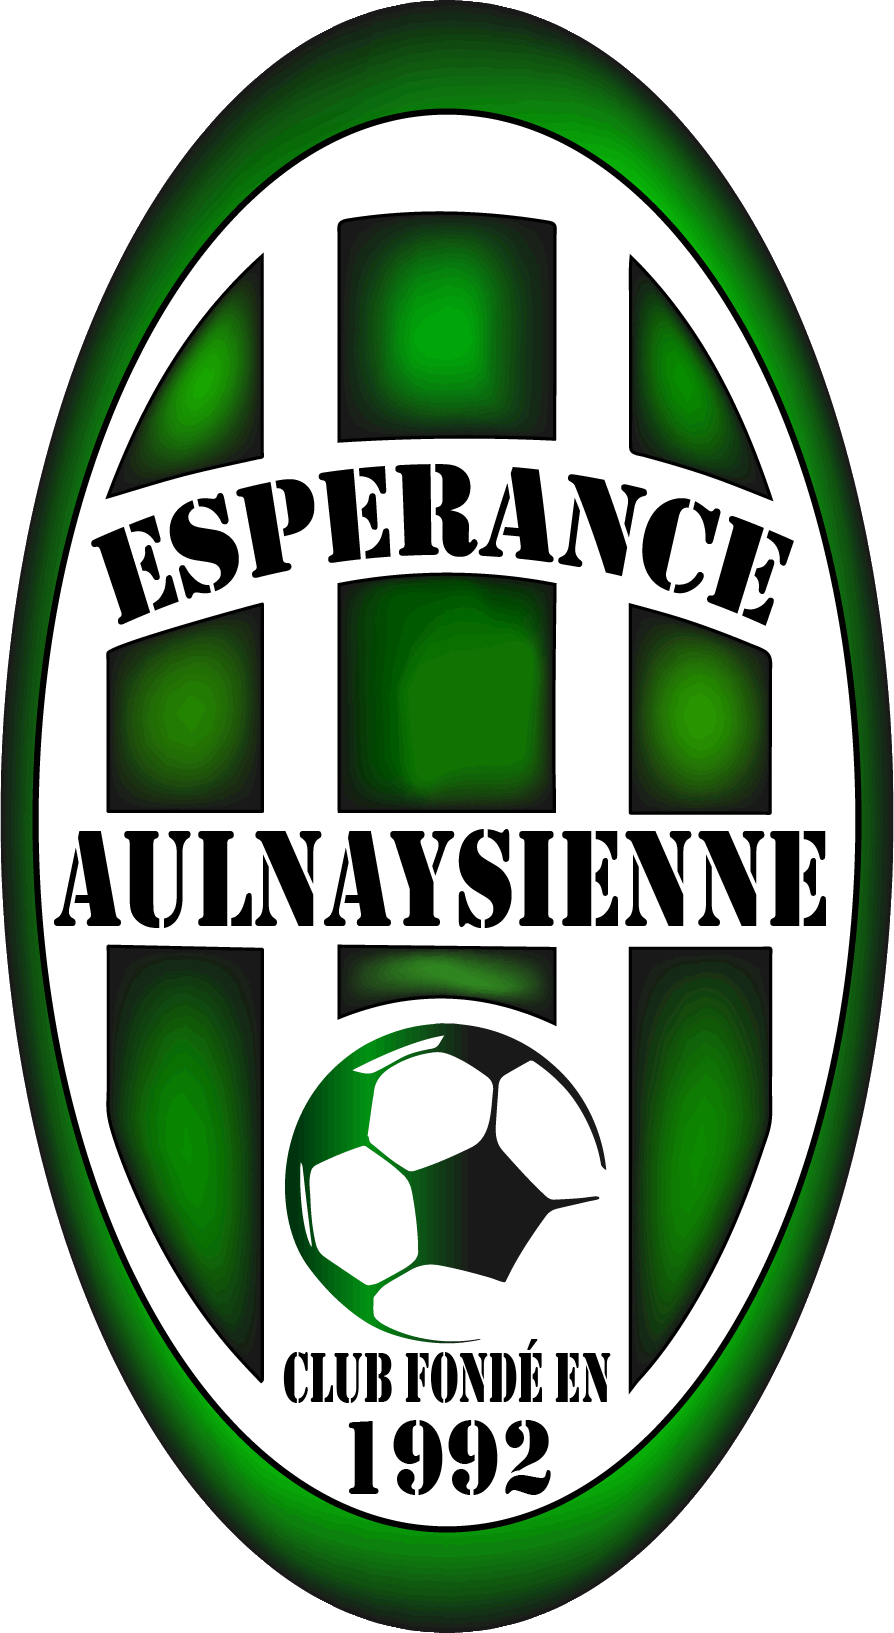 https://www.esperanceaulnaysienne.fr/images/logoea.png